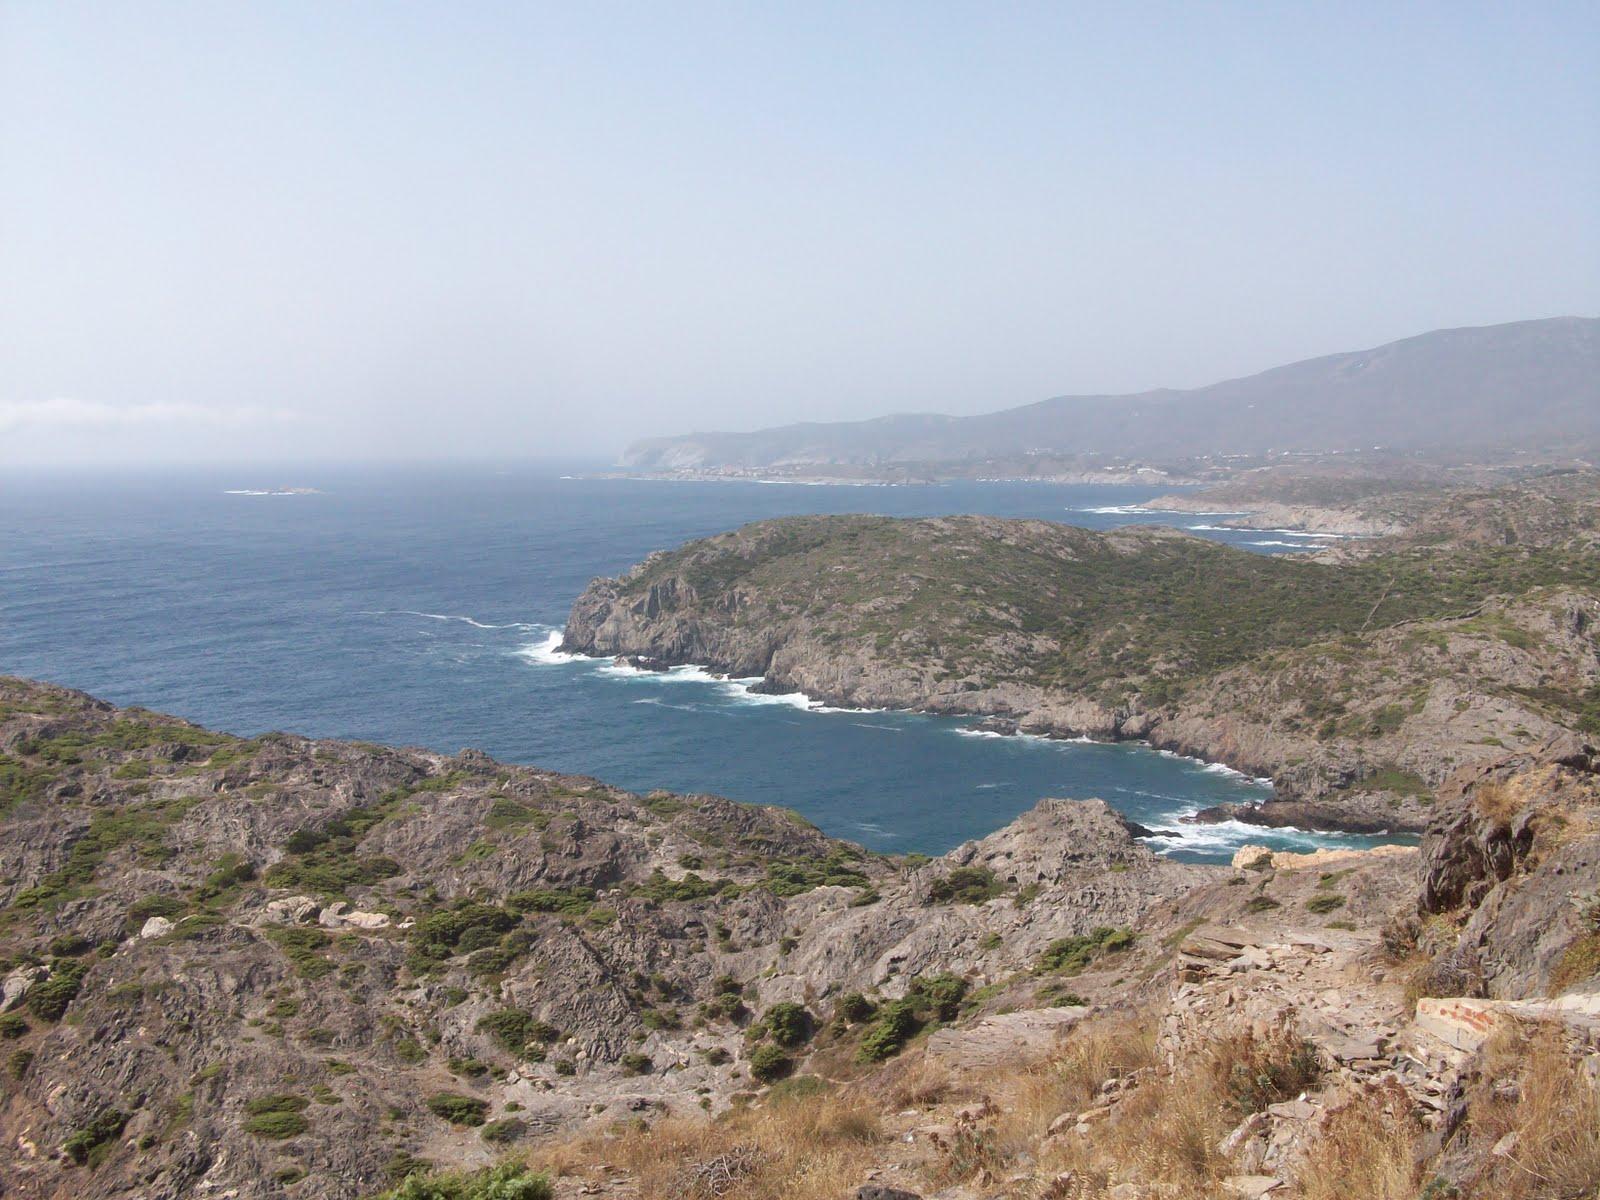 Menorca, IMATGES bwin 5 euro bwin Newsletter D´EN PRIMER: Ciutadella. Jardins de Vigo